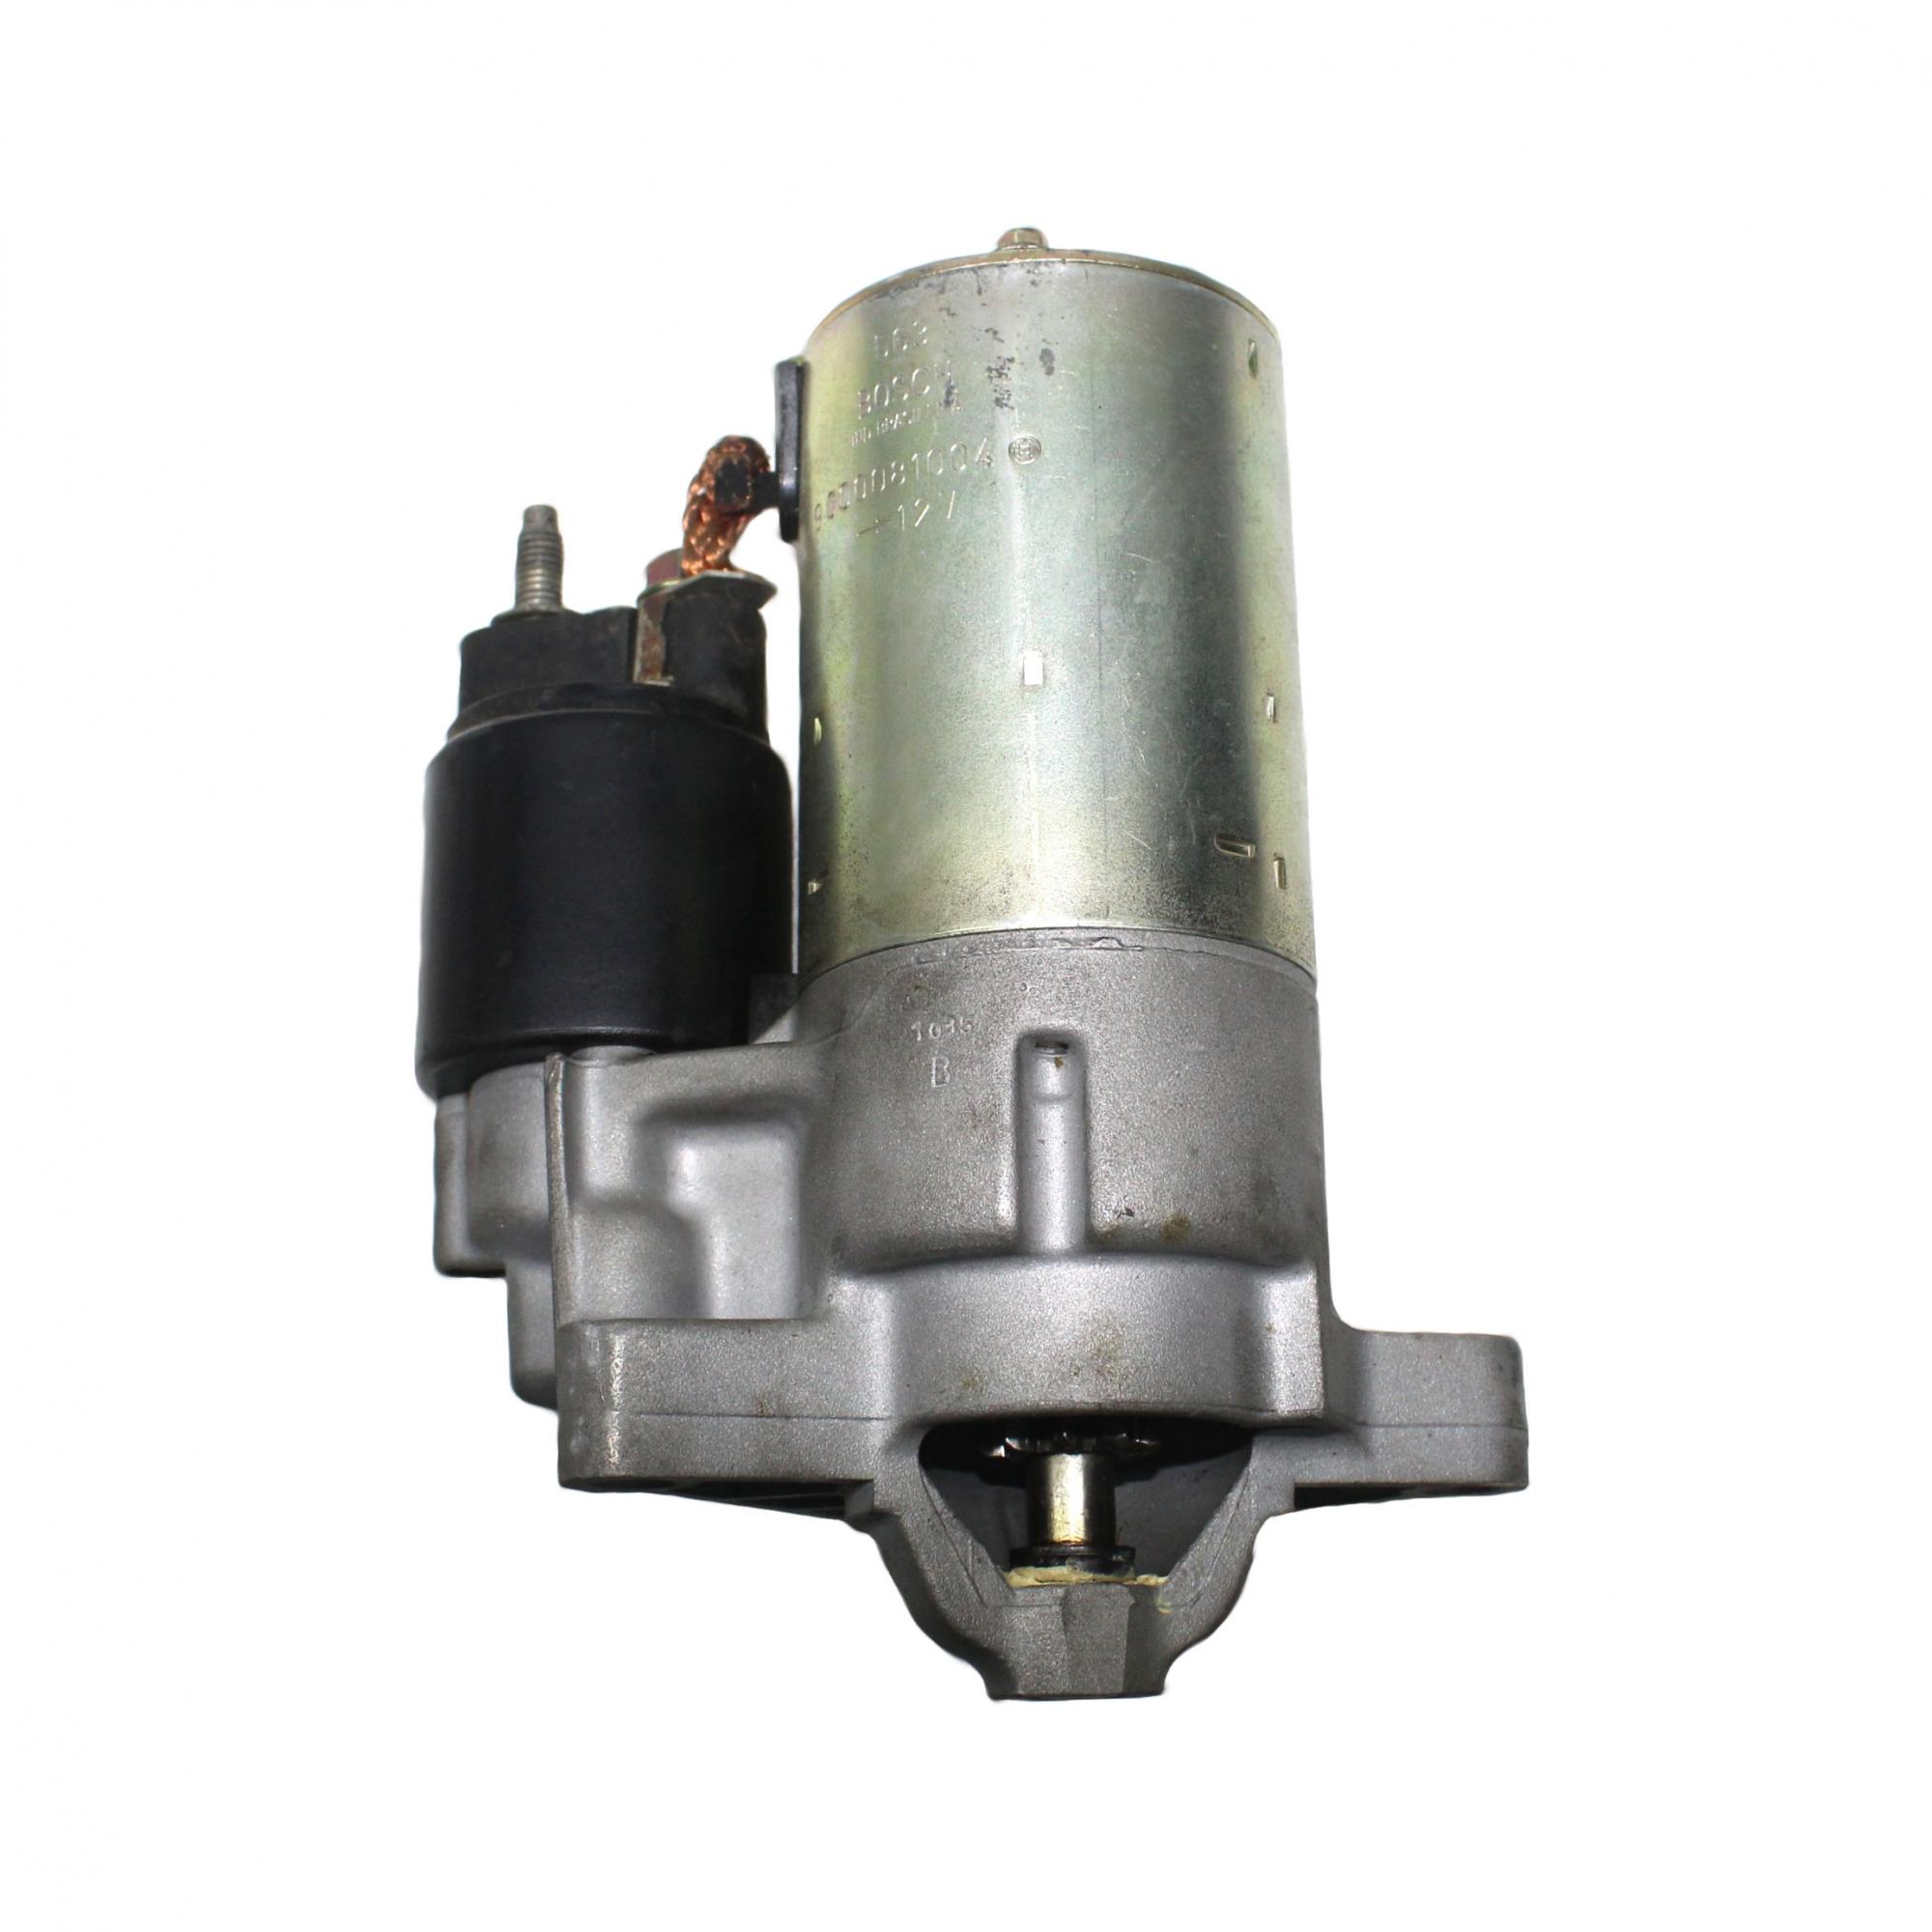 Motor Arranque Partida Bosch 306, 405, Xsara, Berlingo - 1.8 16v F000AL0103